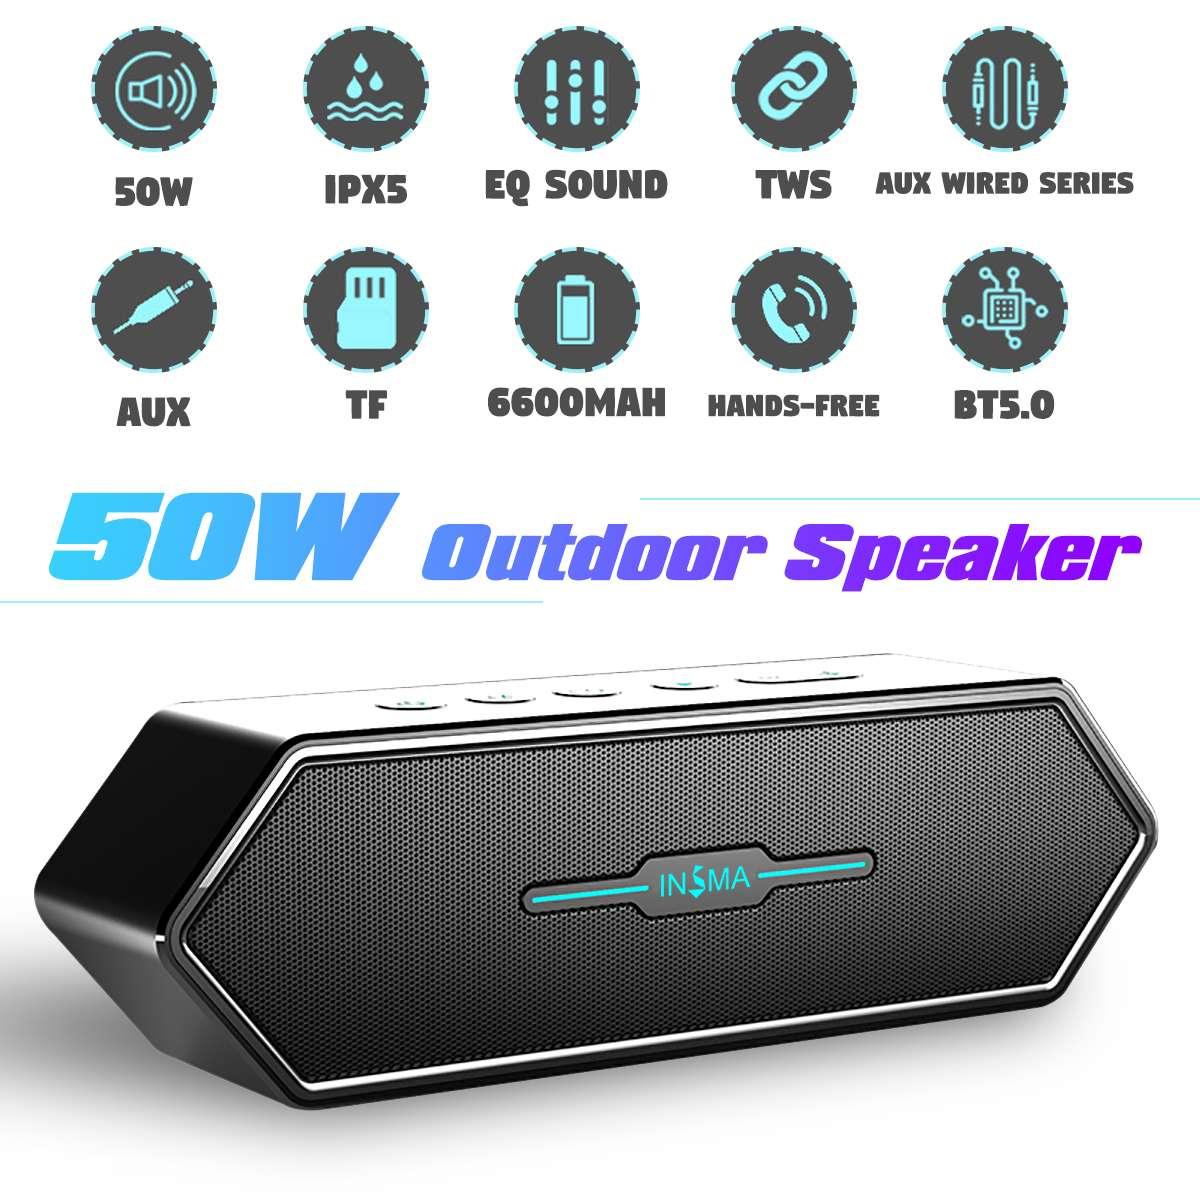 INSMA Aurora Bluetooth 5.0 E-sport Gaming Speaker 50W 6600mah Portable Speaker Enhanced Bass TWS Column IPX5 Waterproof Soundbar